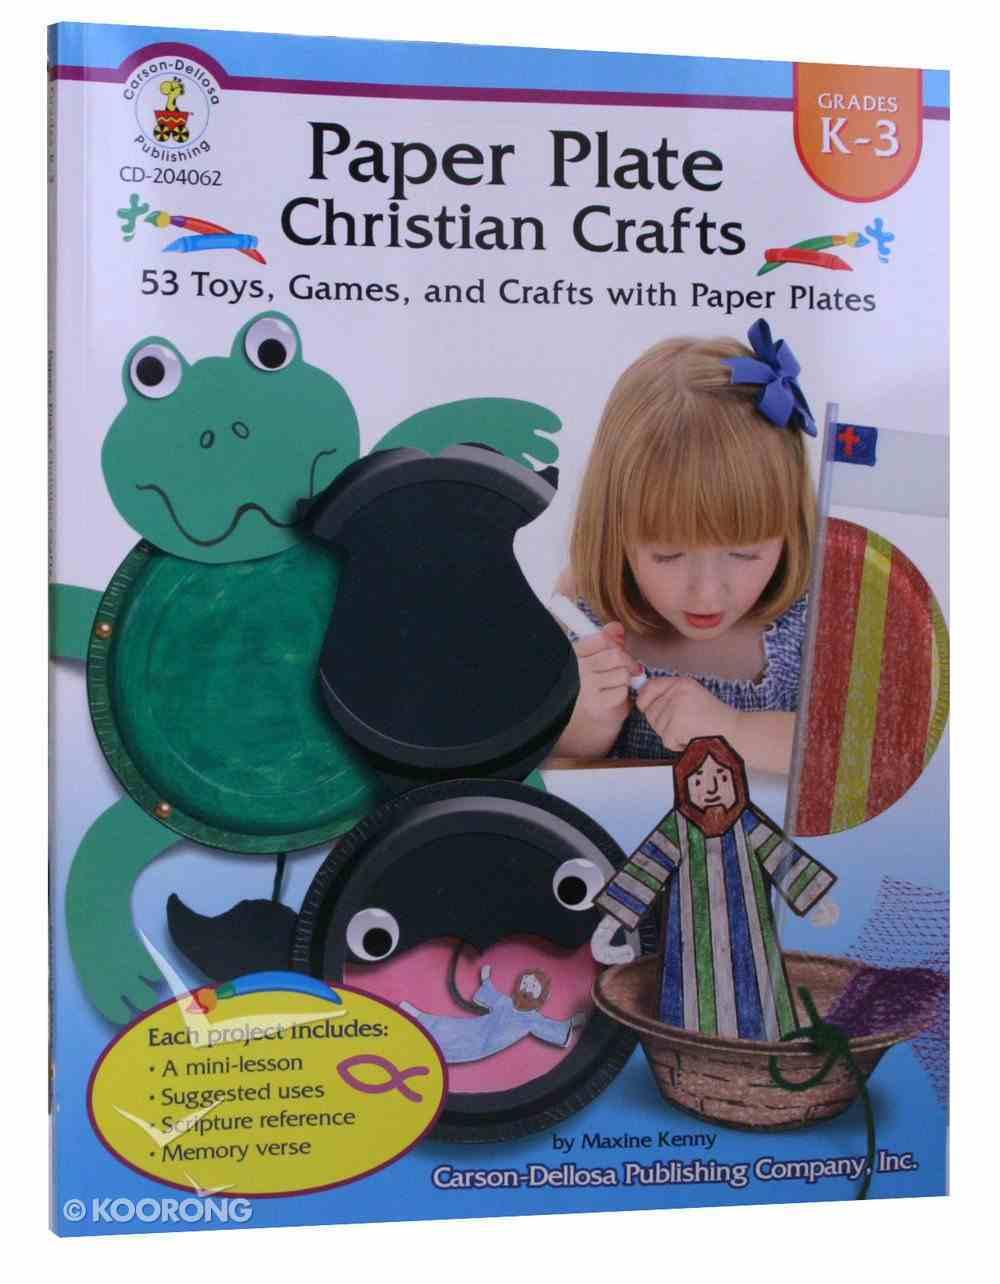 Paper Plate Christian Crafts (K-3) Paperback